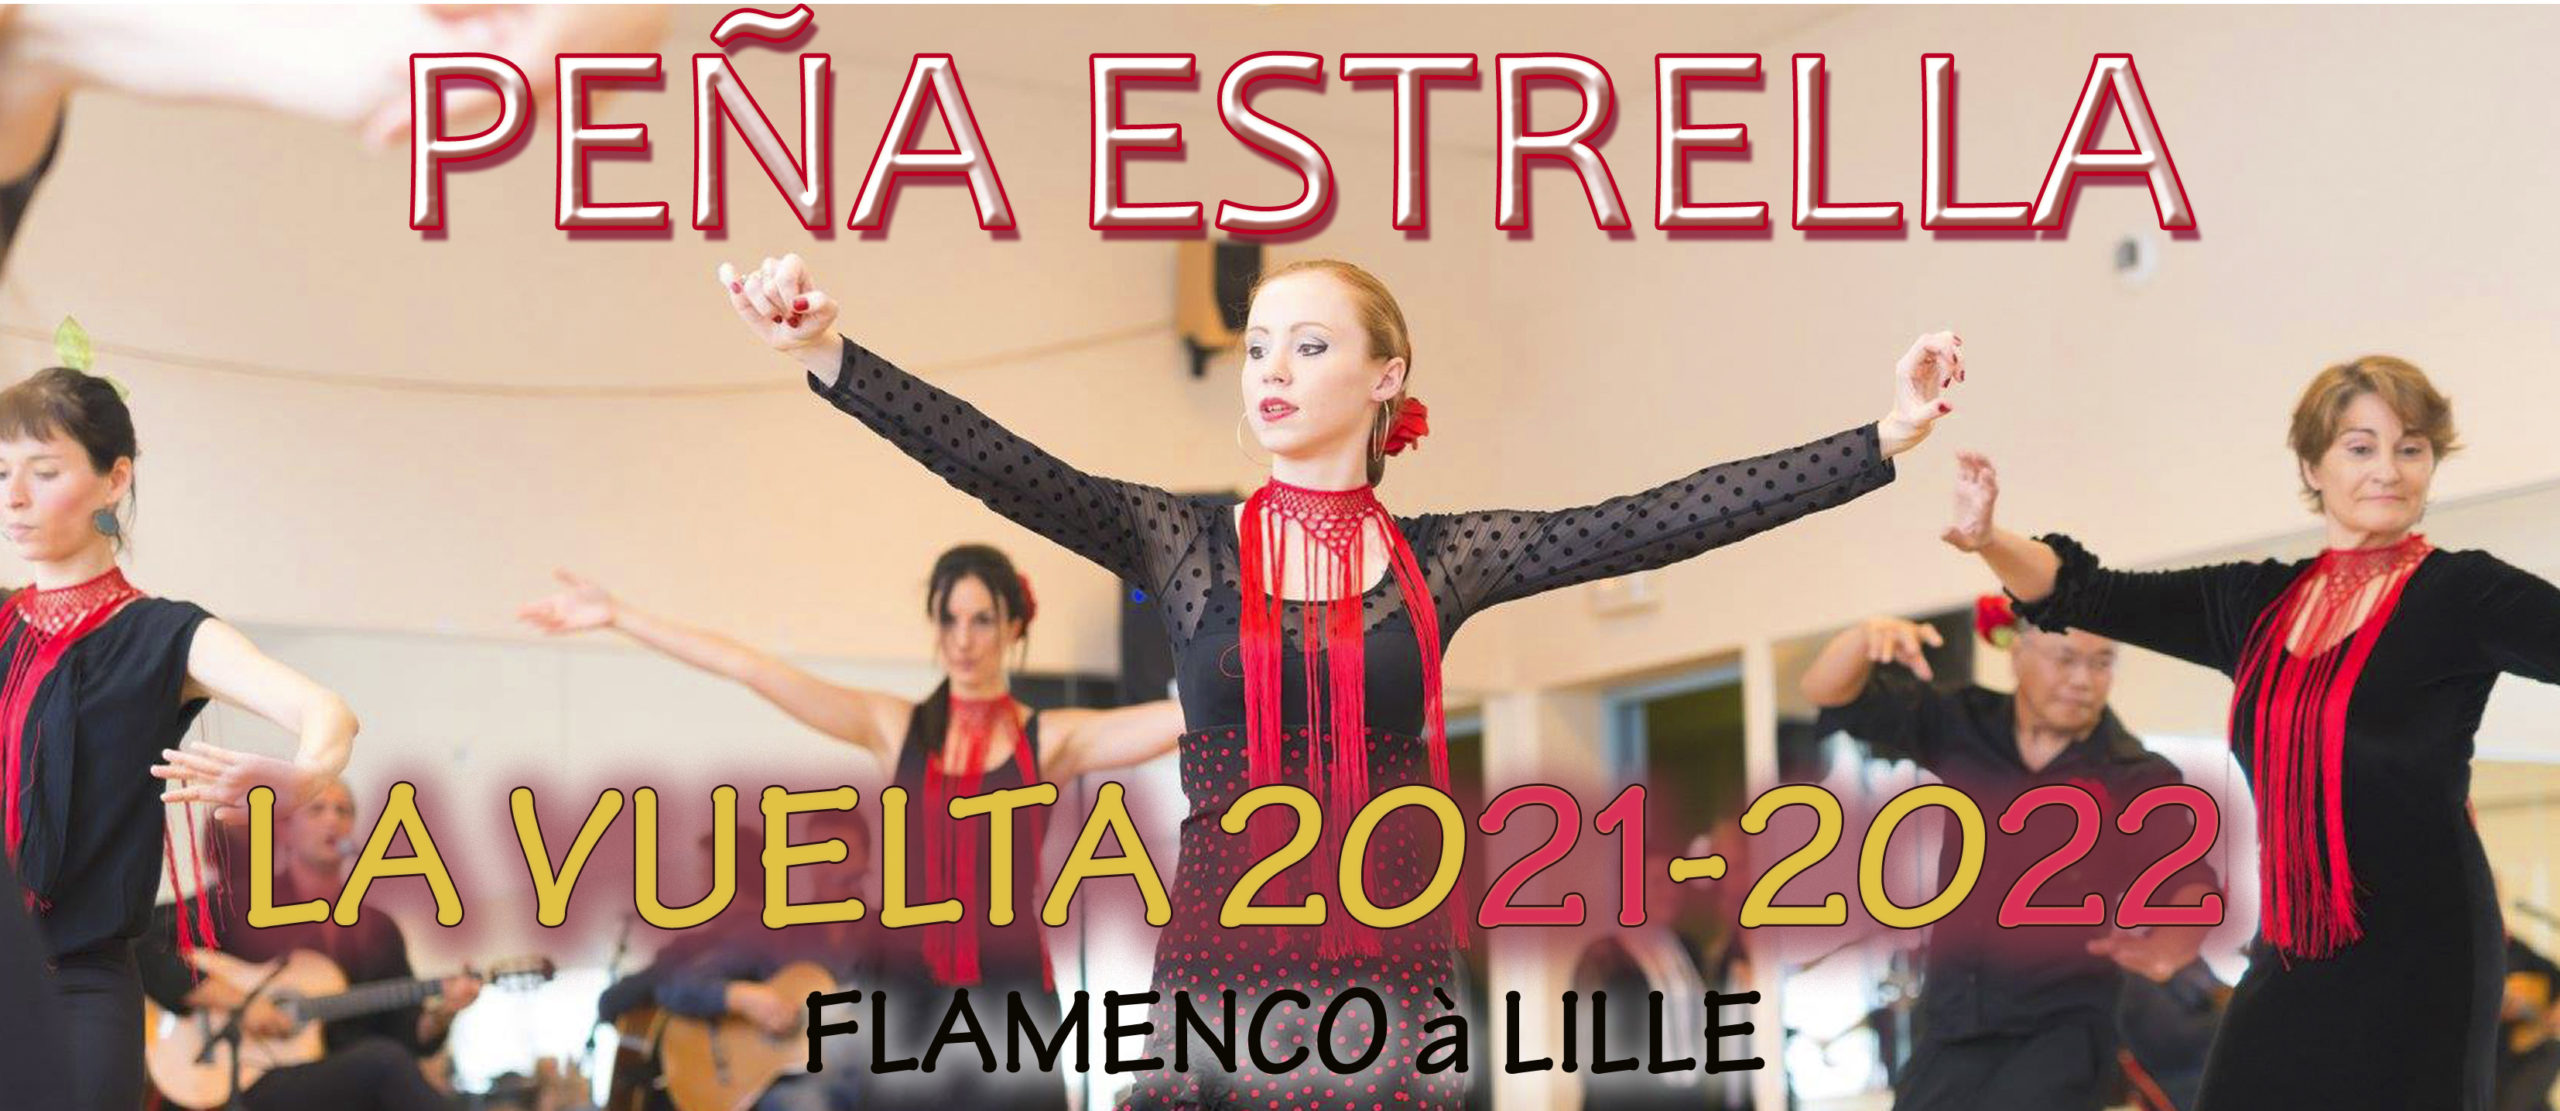 FLAMENCO LILLE RENTRÉE 2021-2022 ADULTES ENFANTS PEÑA ESTRELLA